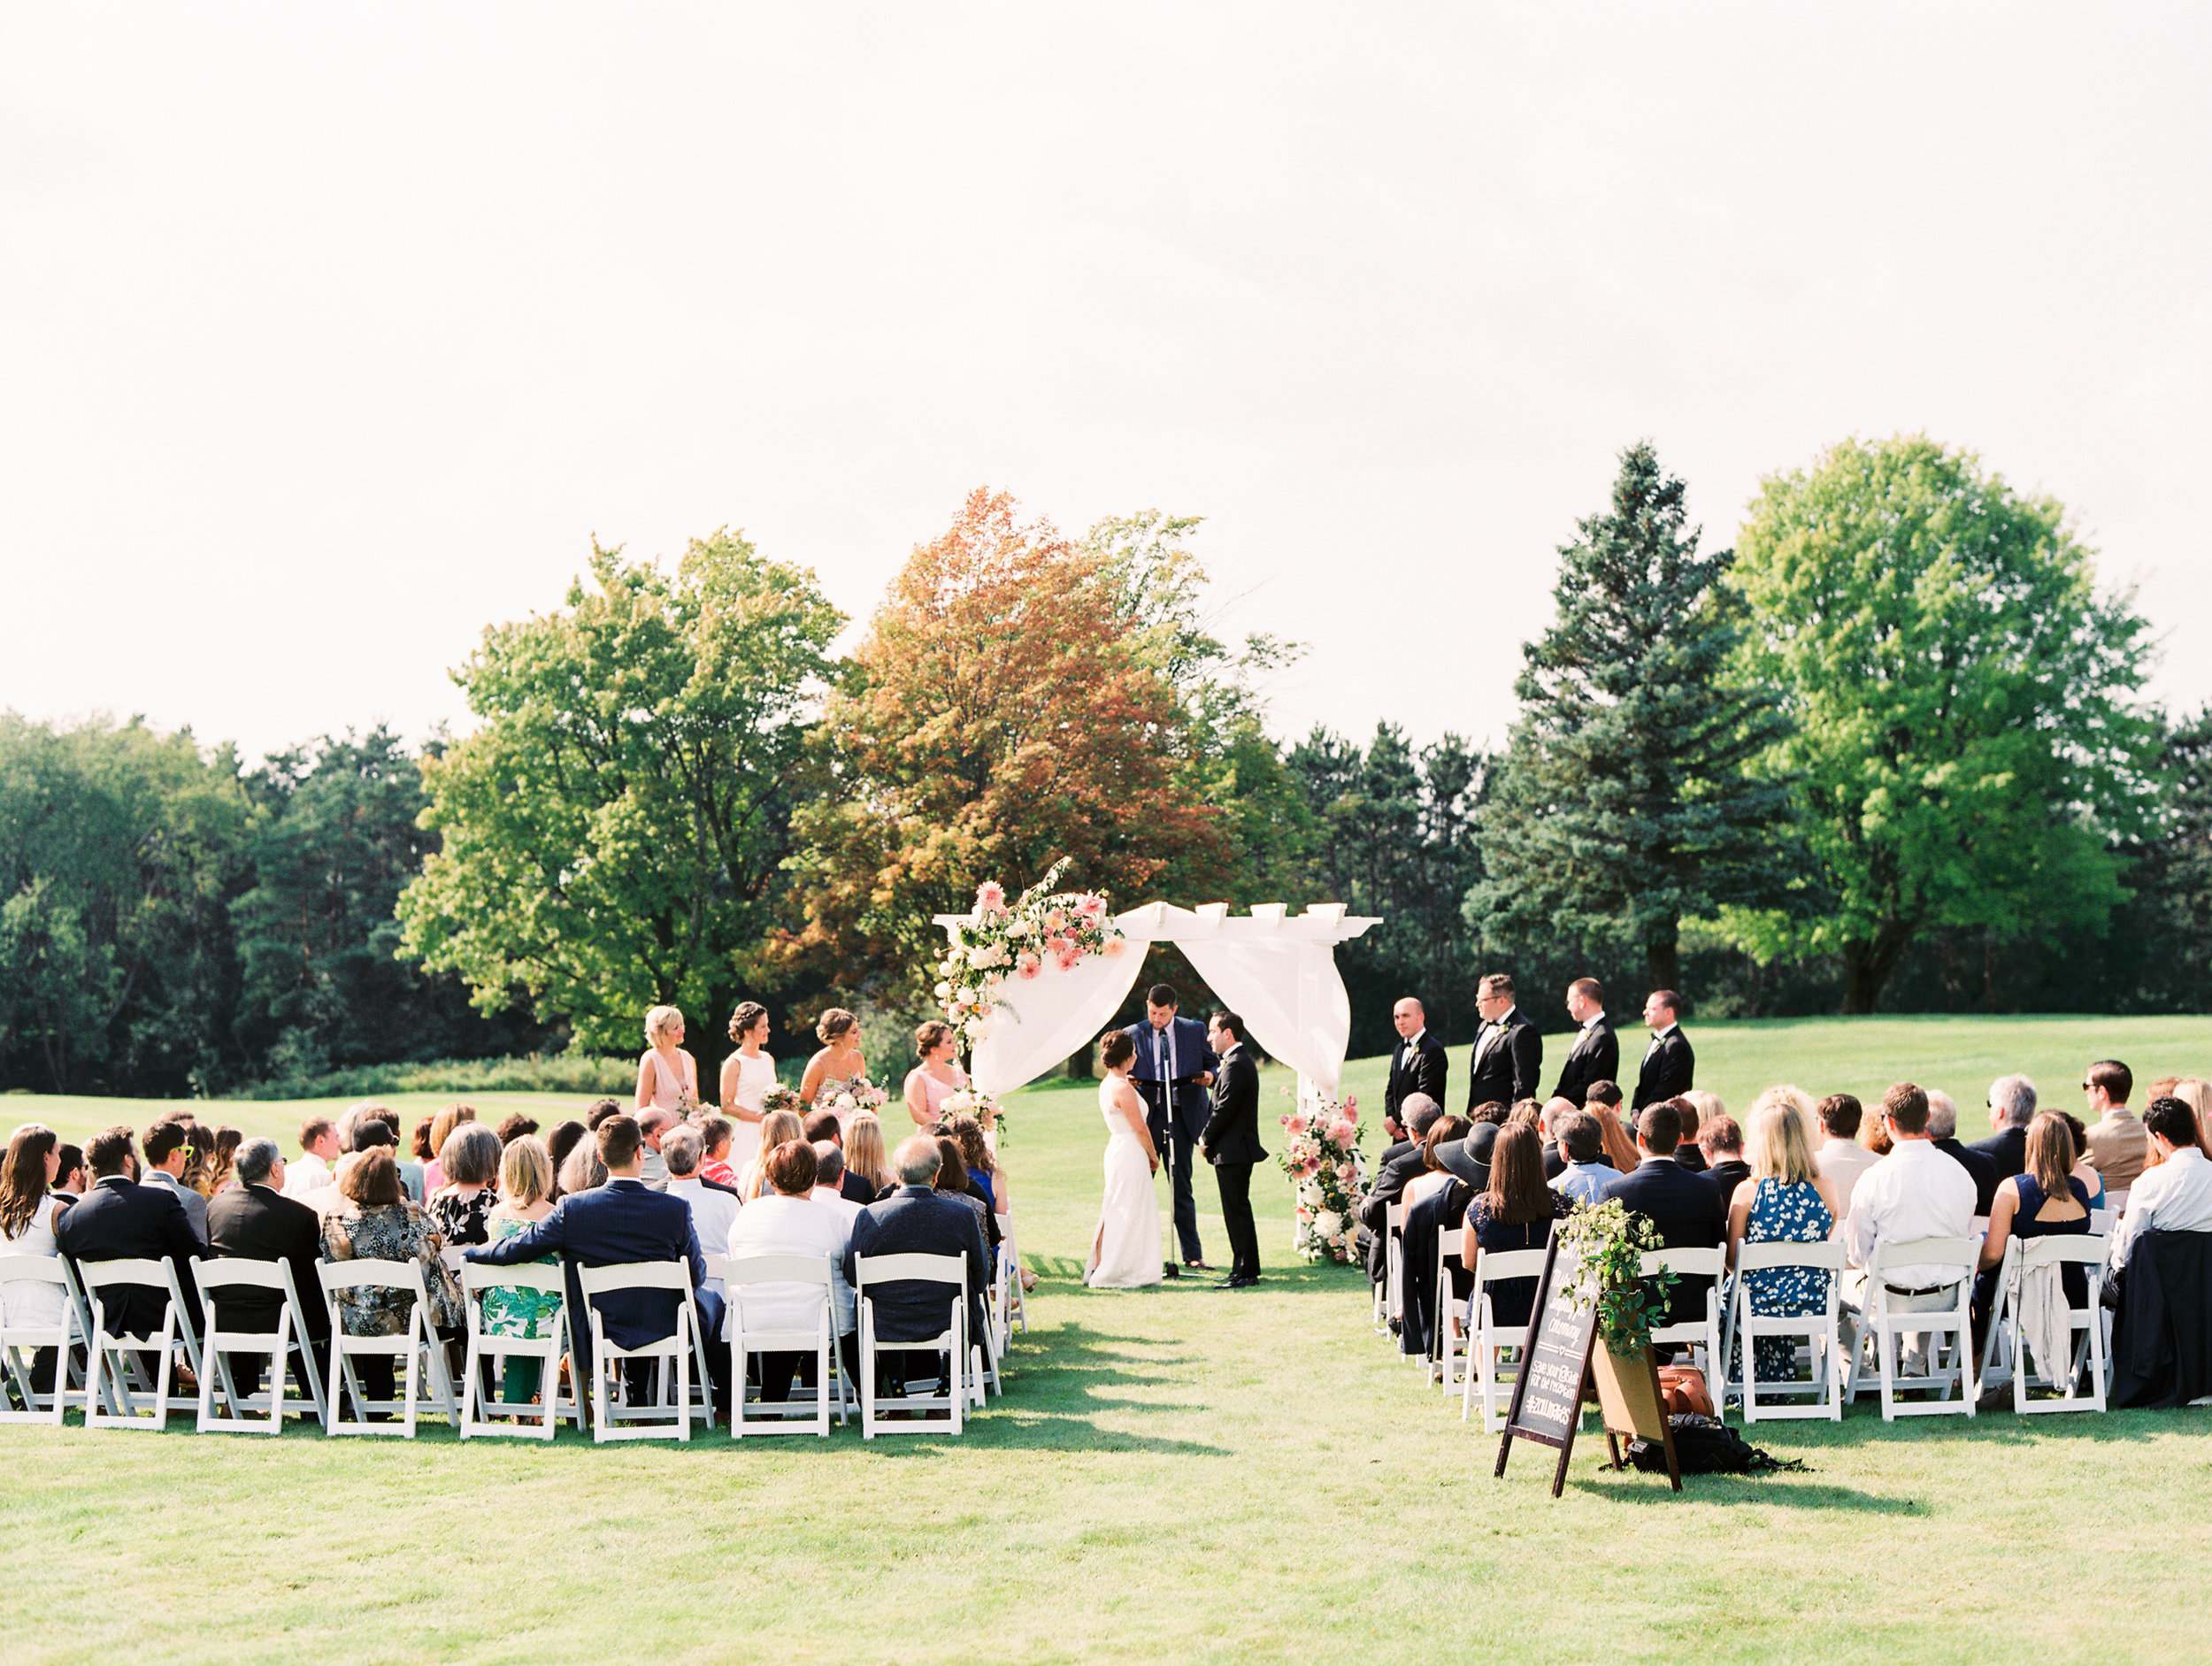 Zoller+Wedding+Ceremonyf-28.jpg